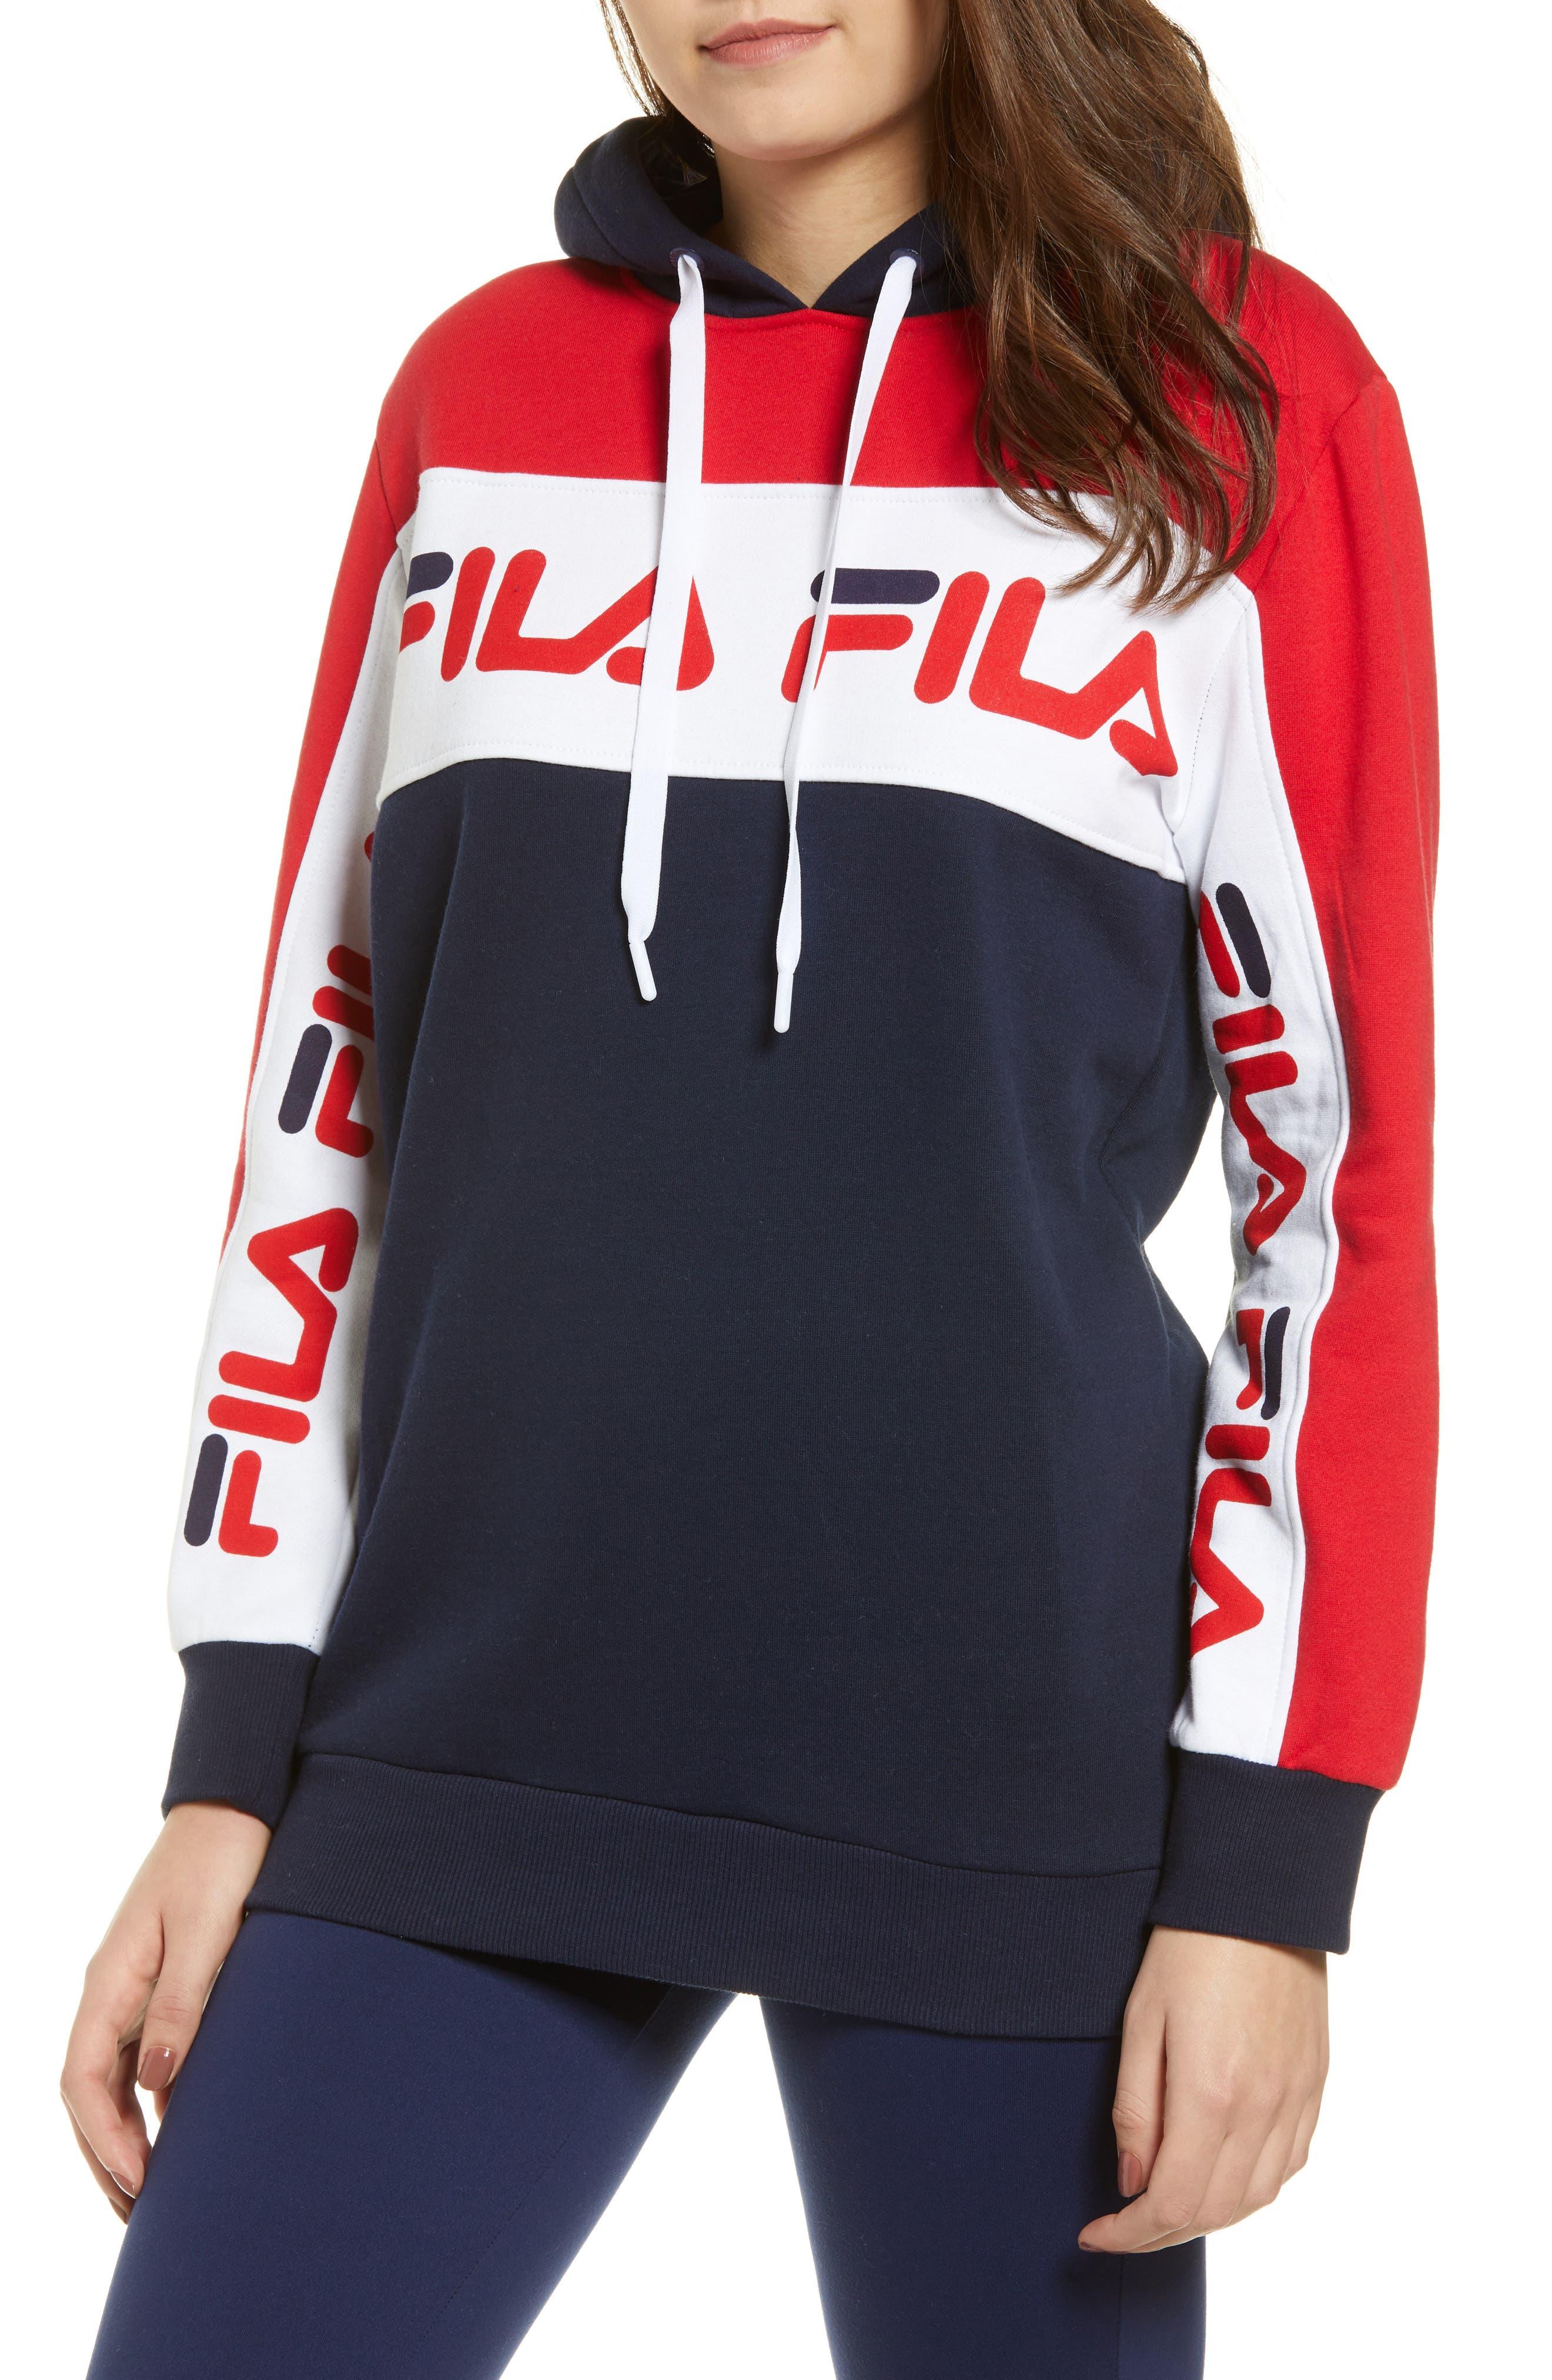 Fila Rita Oversize Hooded Sweatshirt